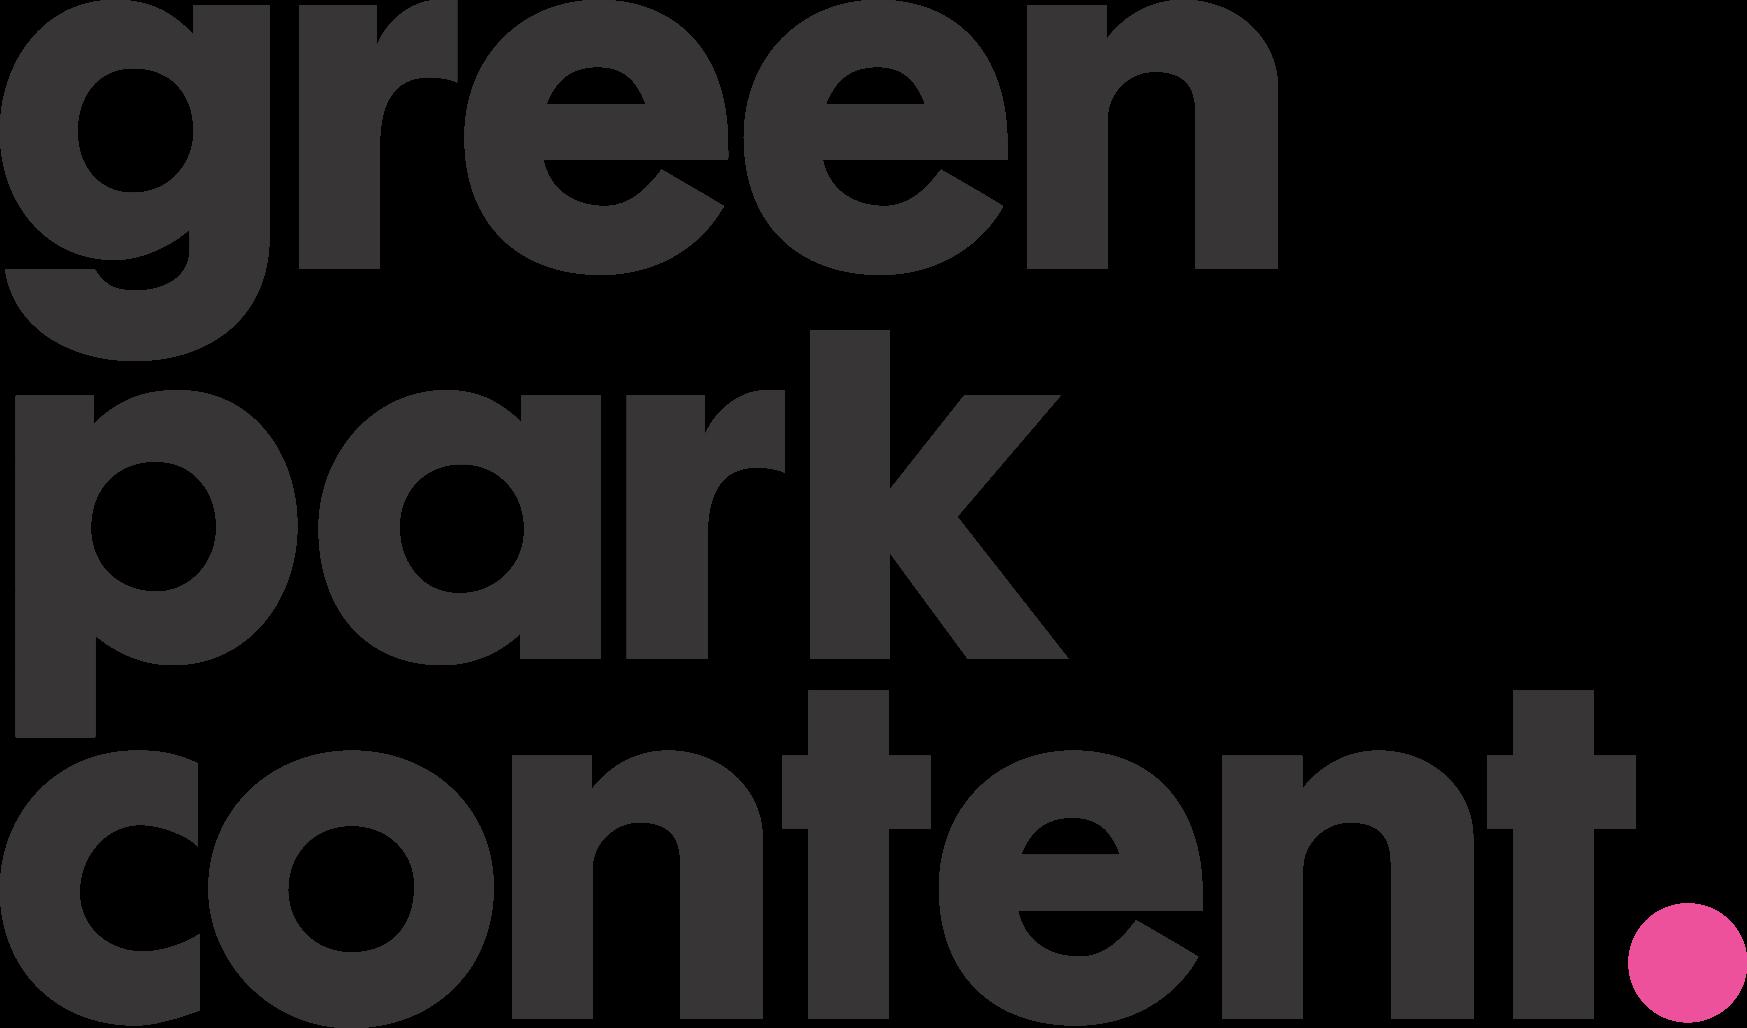 Green Park Content company logo